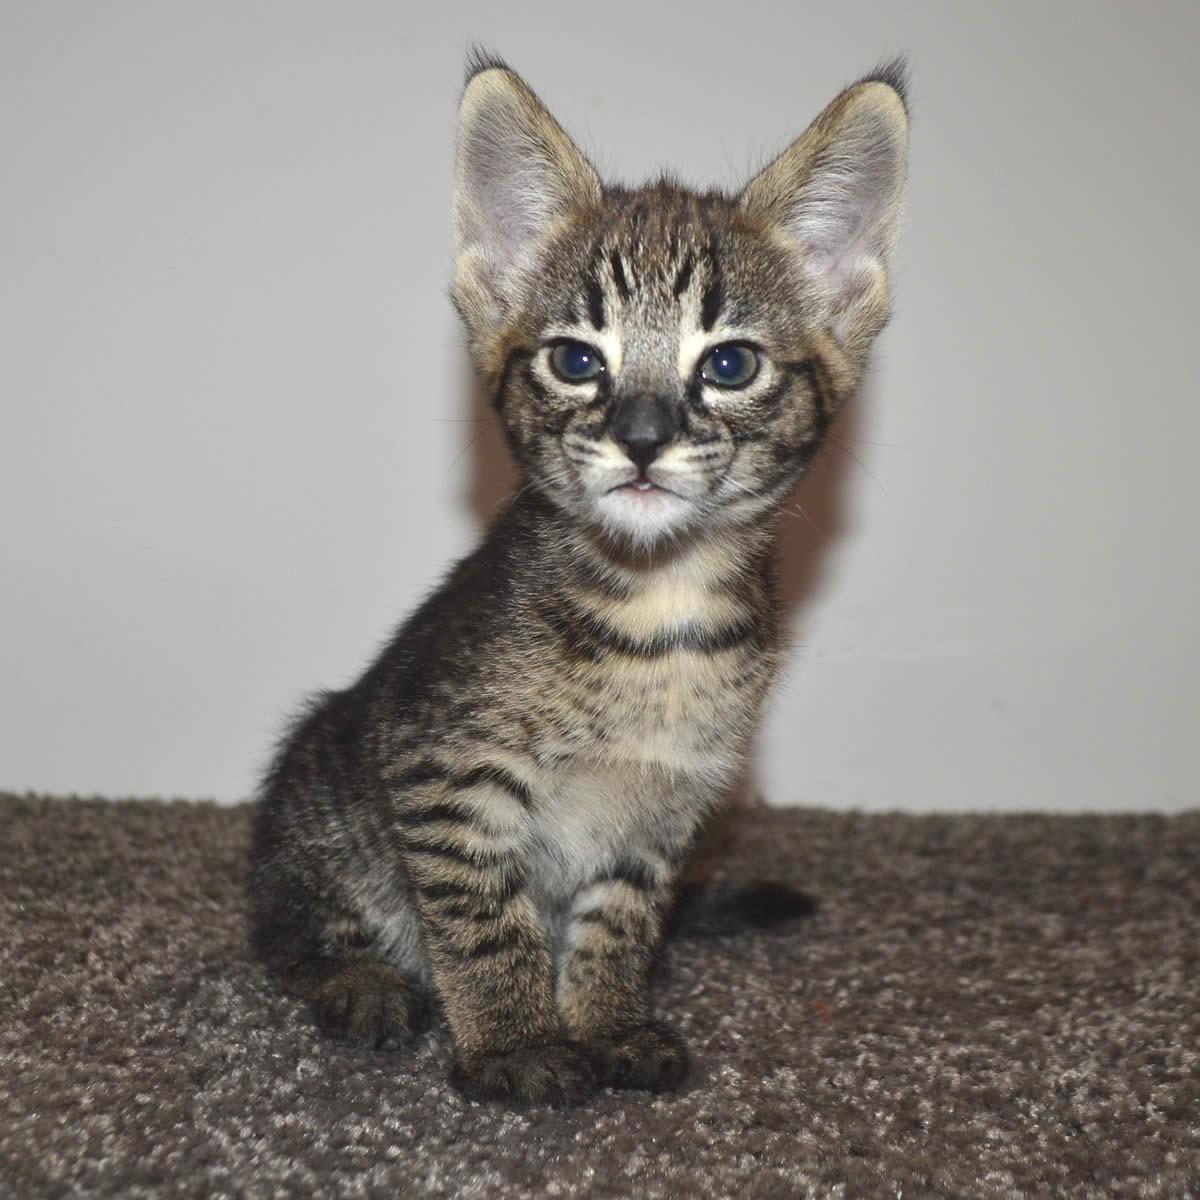 Kittens For Sale Illinois